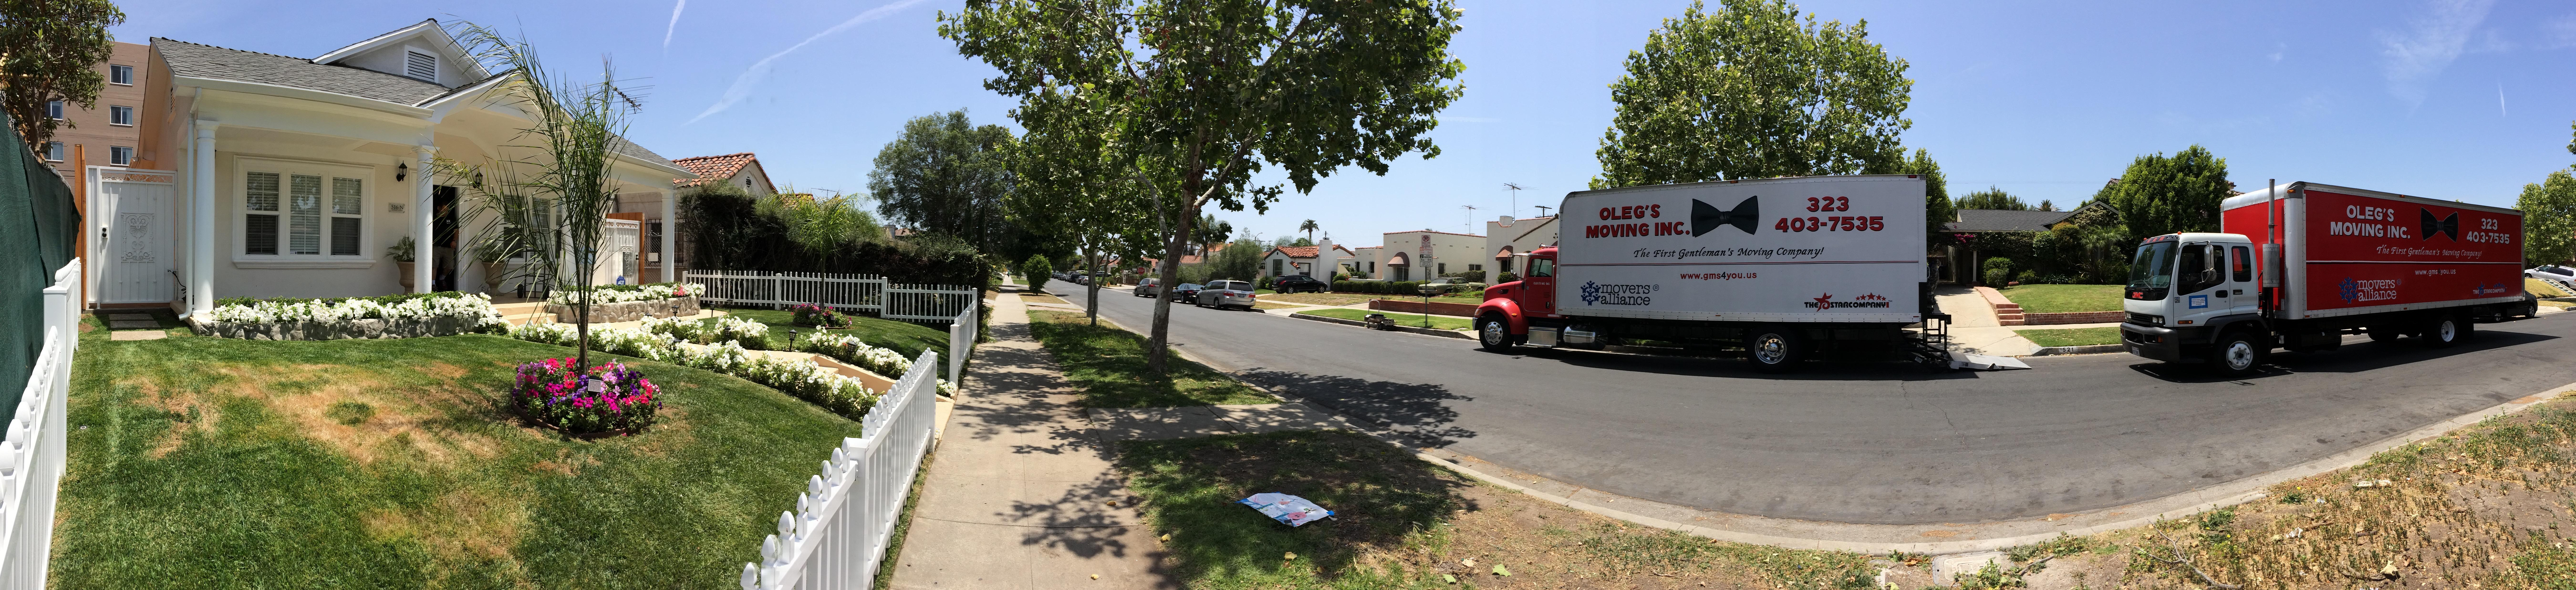 Movers in Burbank, CA